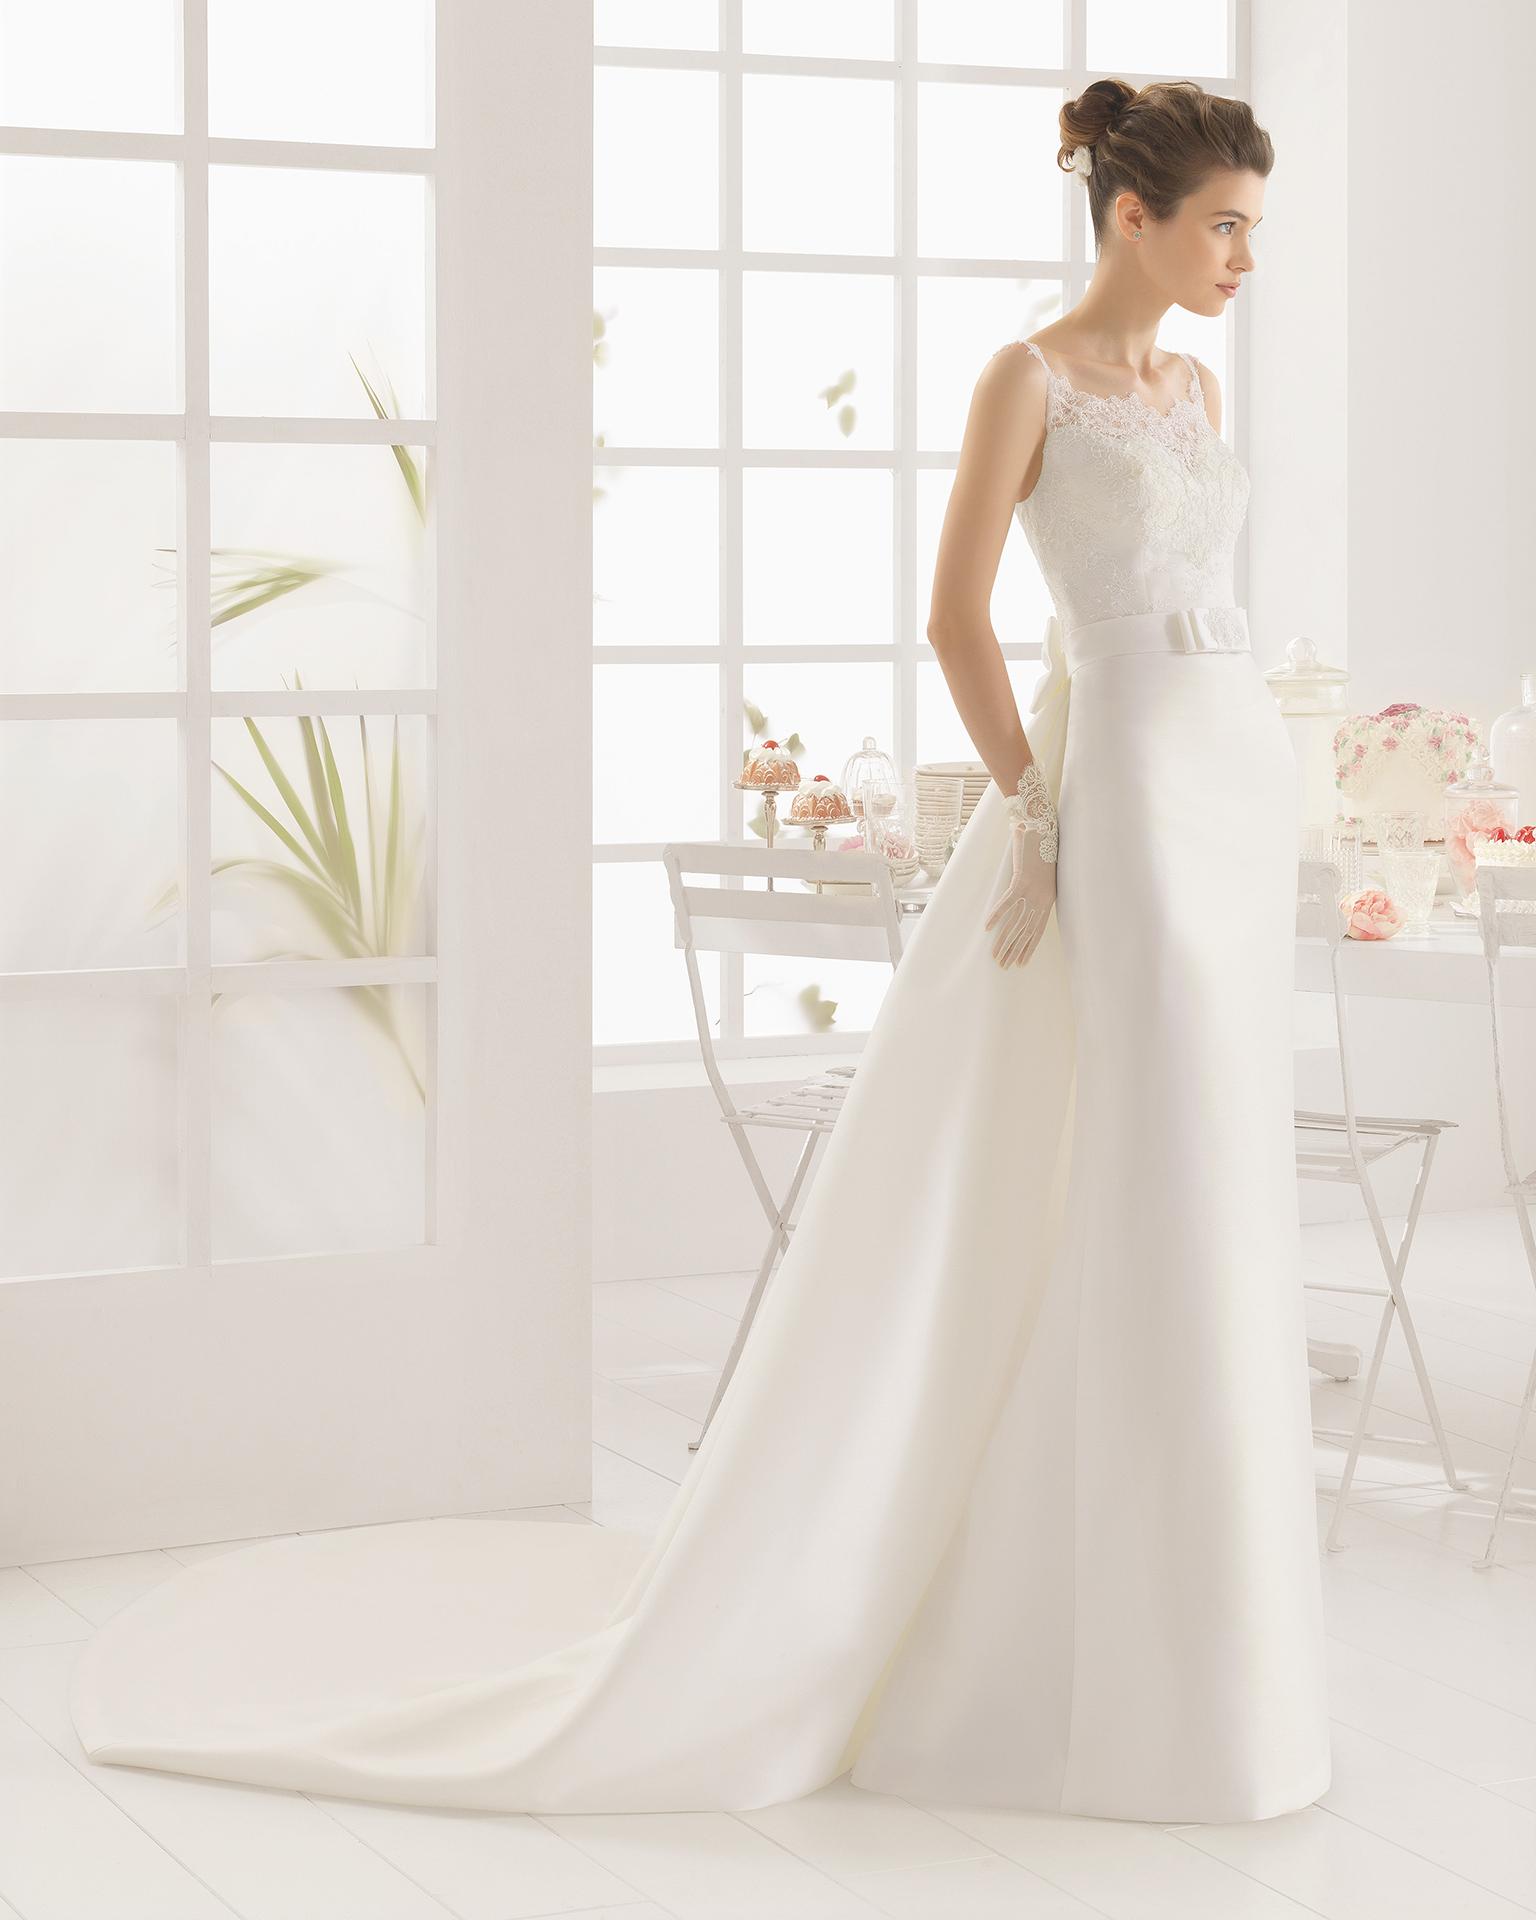 MELYS beaded mikado, duchess satin and lace wedding dress.